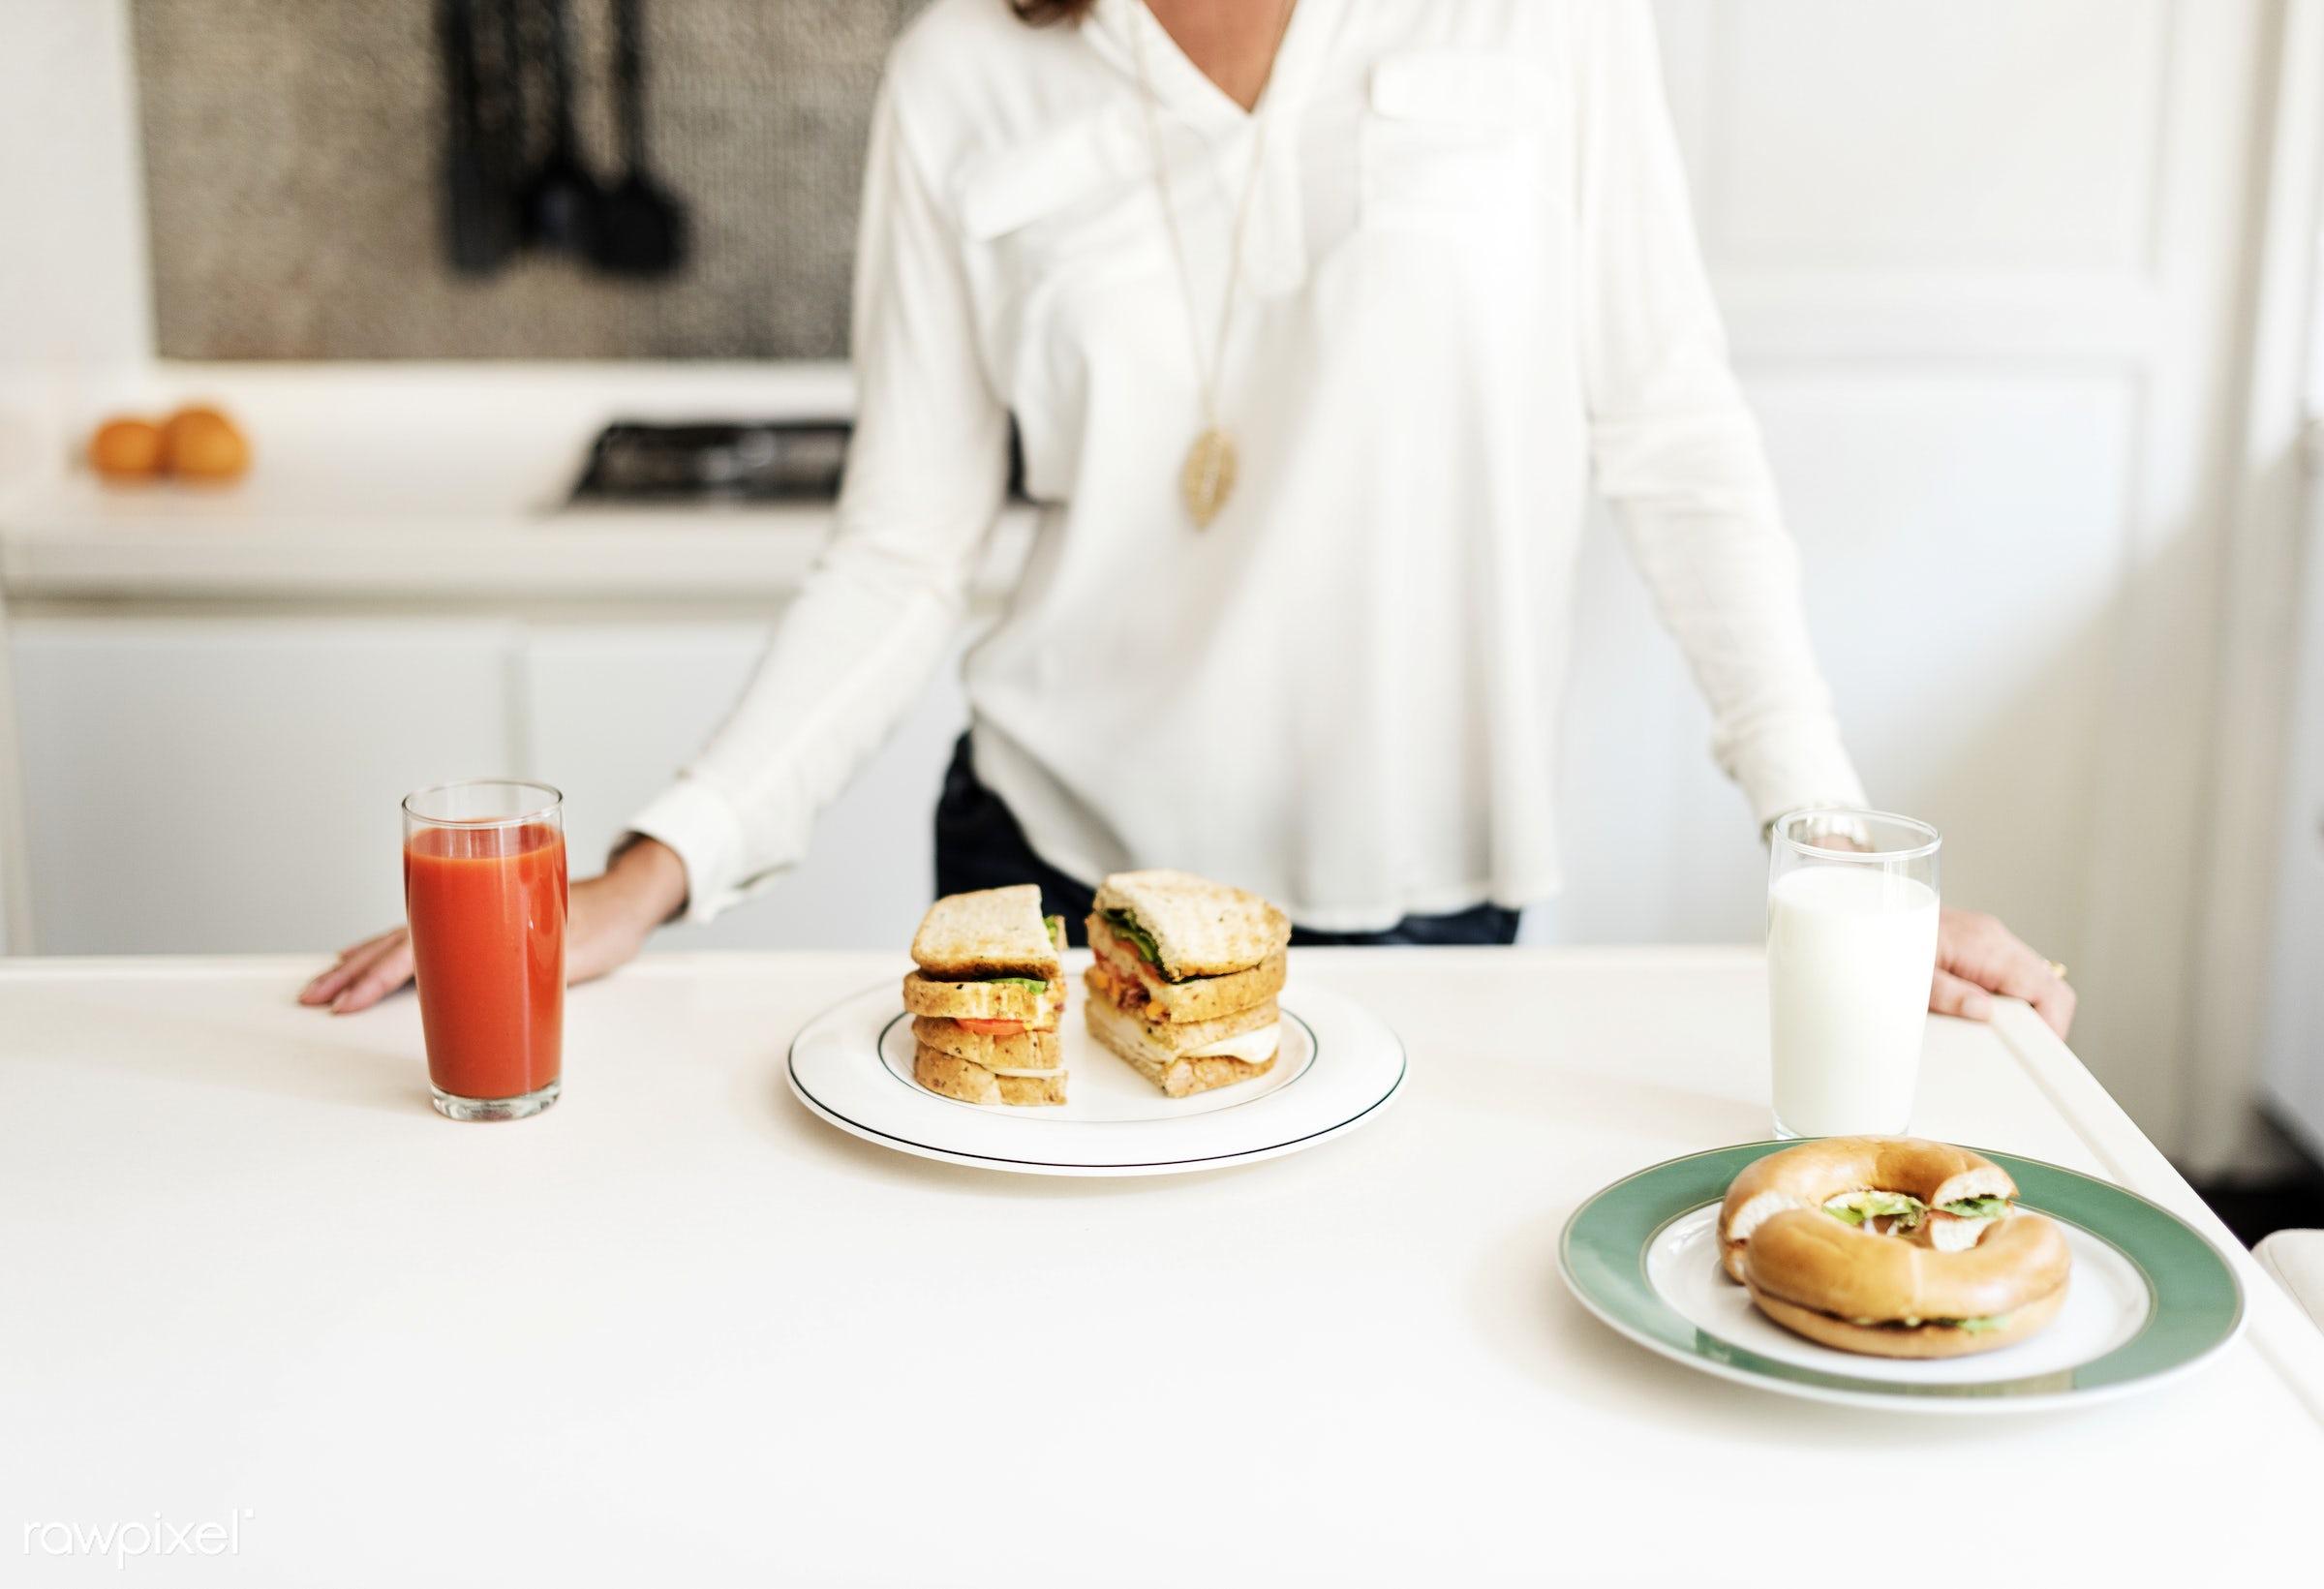 breakfast, white table, kitchen, homemade, snack, sandwich, milk, food, drink, juice, bagel, meal